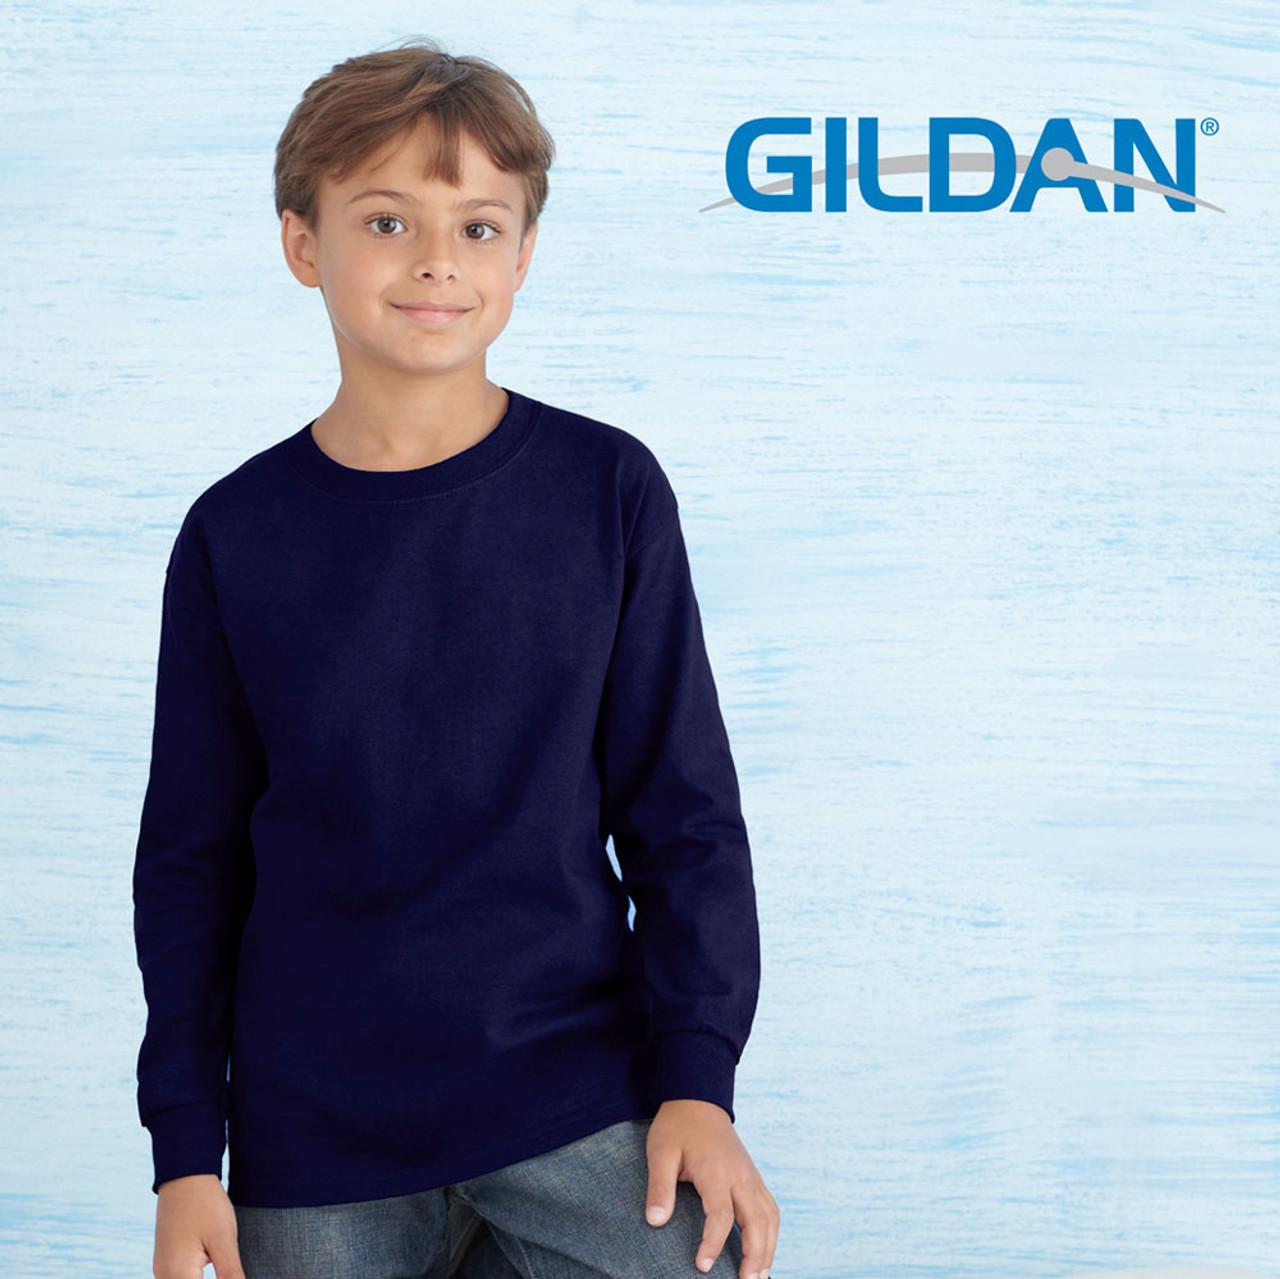 Gildan 100/% Ultra Cotton Tee White 12 Lot SM to XL